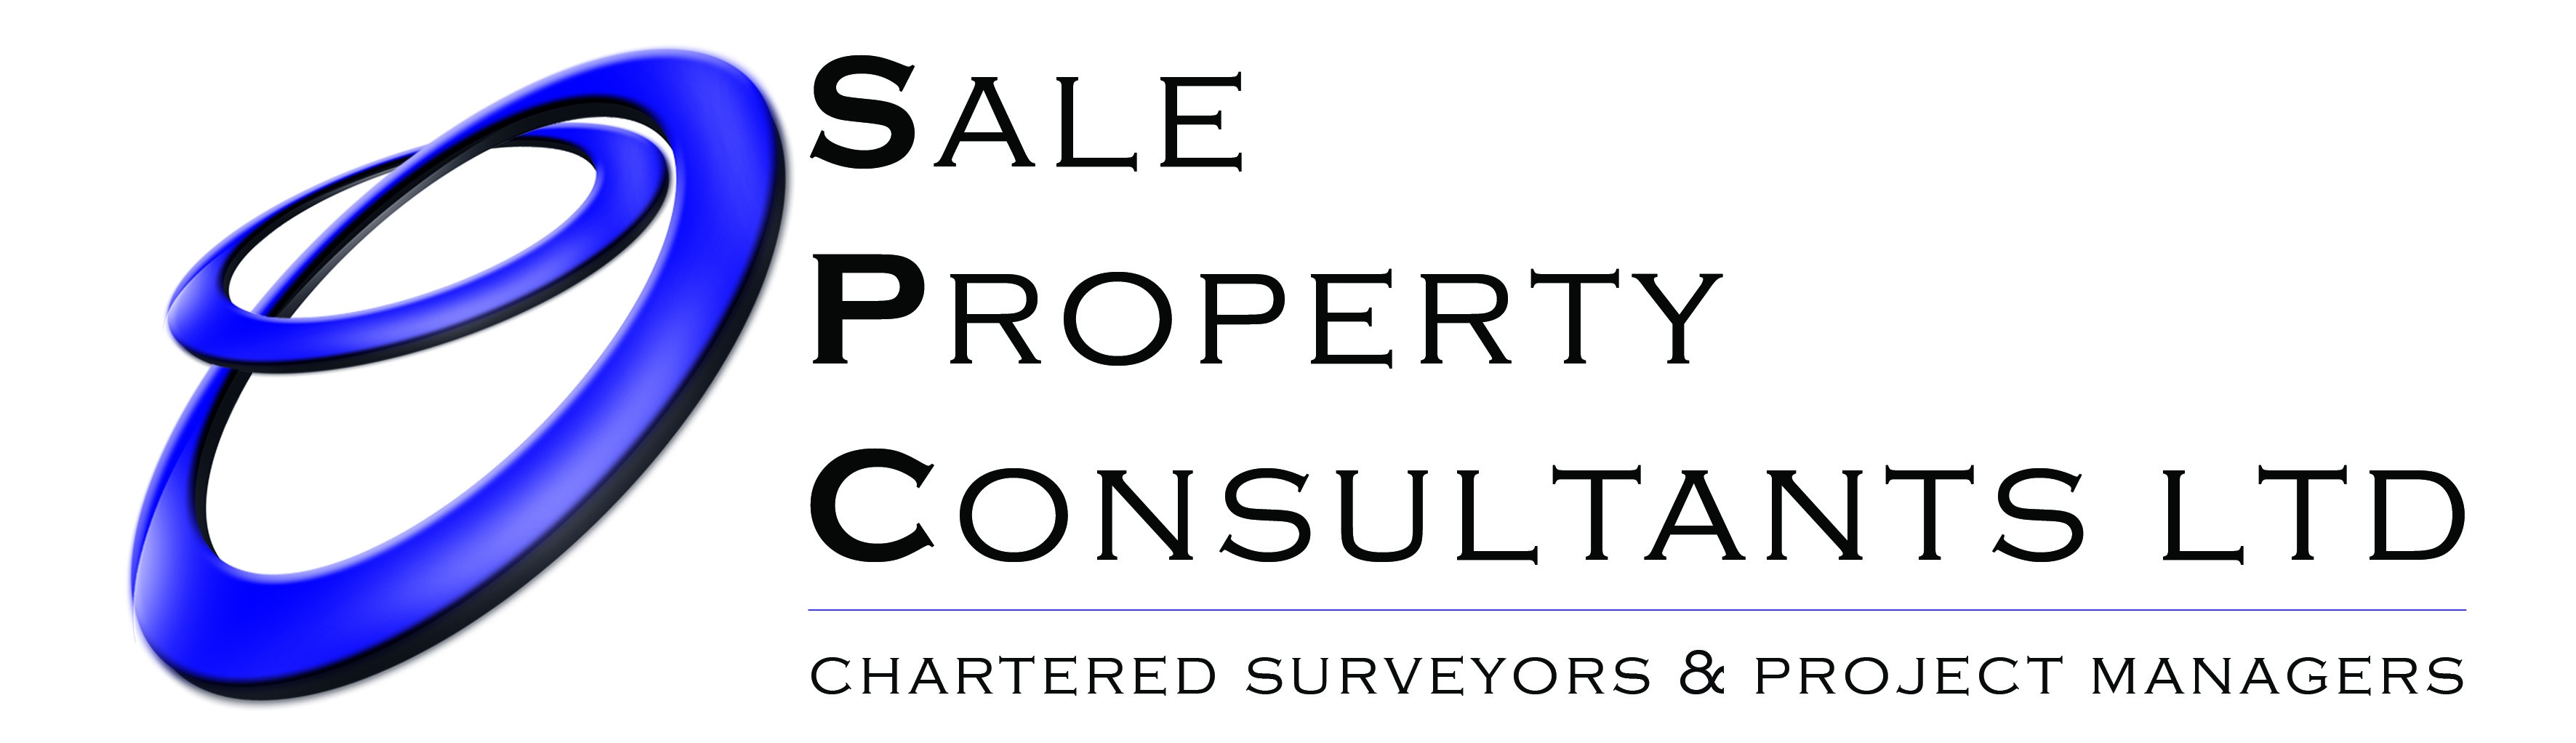 sale property consultants ltd